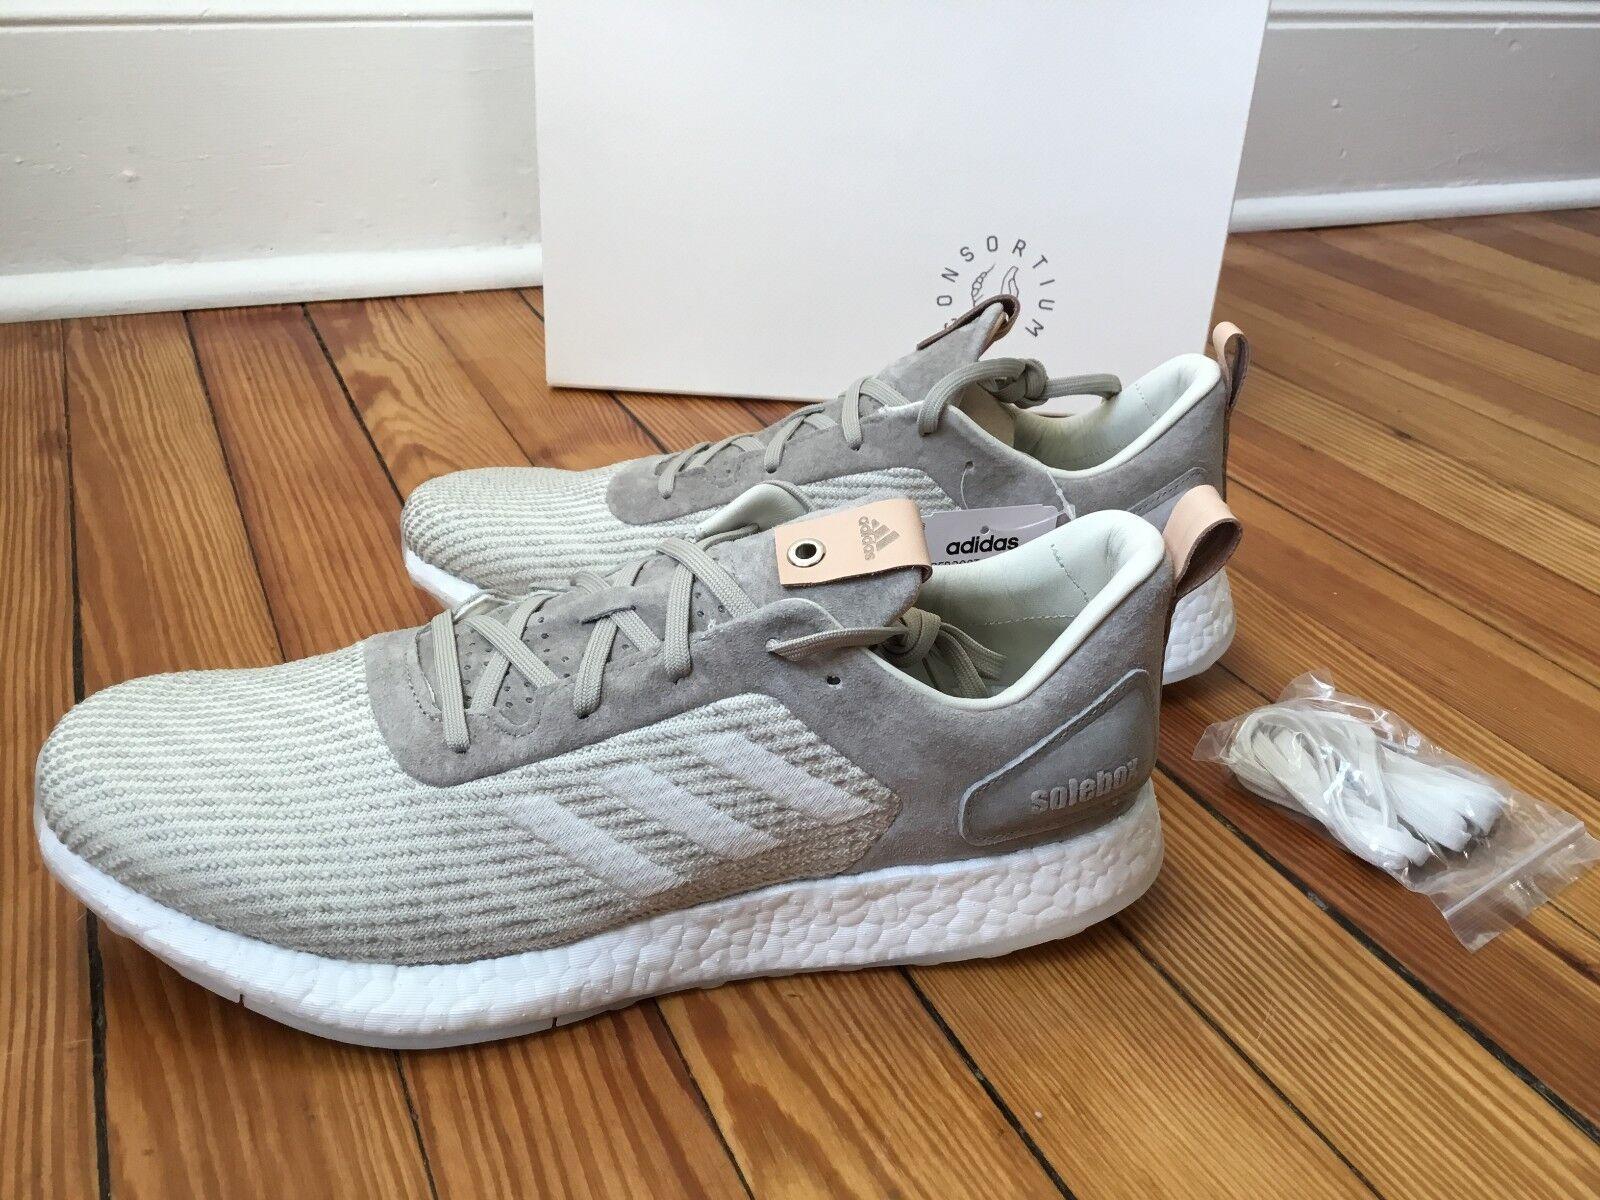 sports shoes 4d11c c4cc7 Adidas pureboost dpr n. solebox puro puro puro slancio scarpe da uomo.  b27992 46